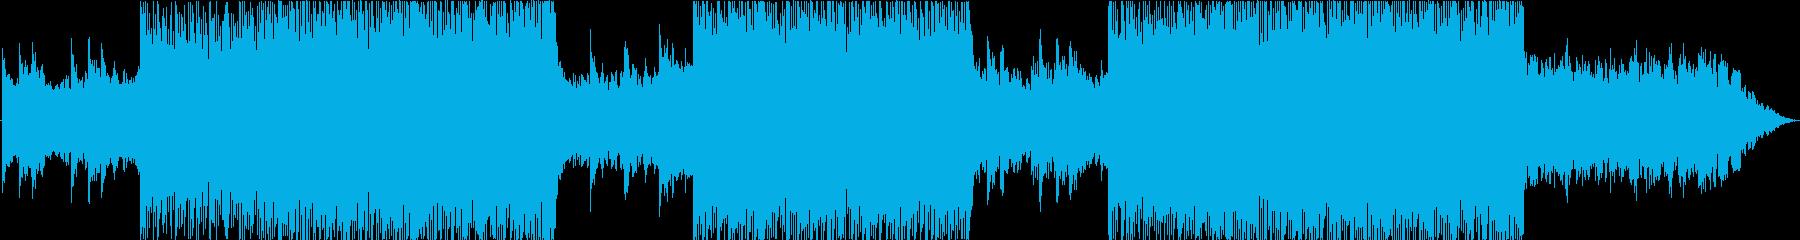 【BGM】kawaii bassの再生済みの波形